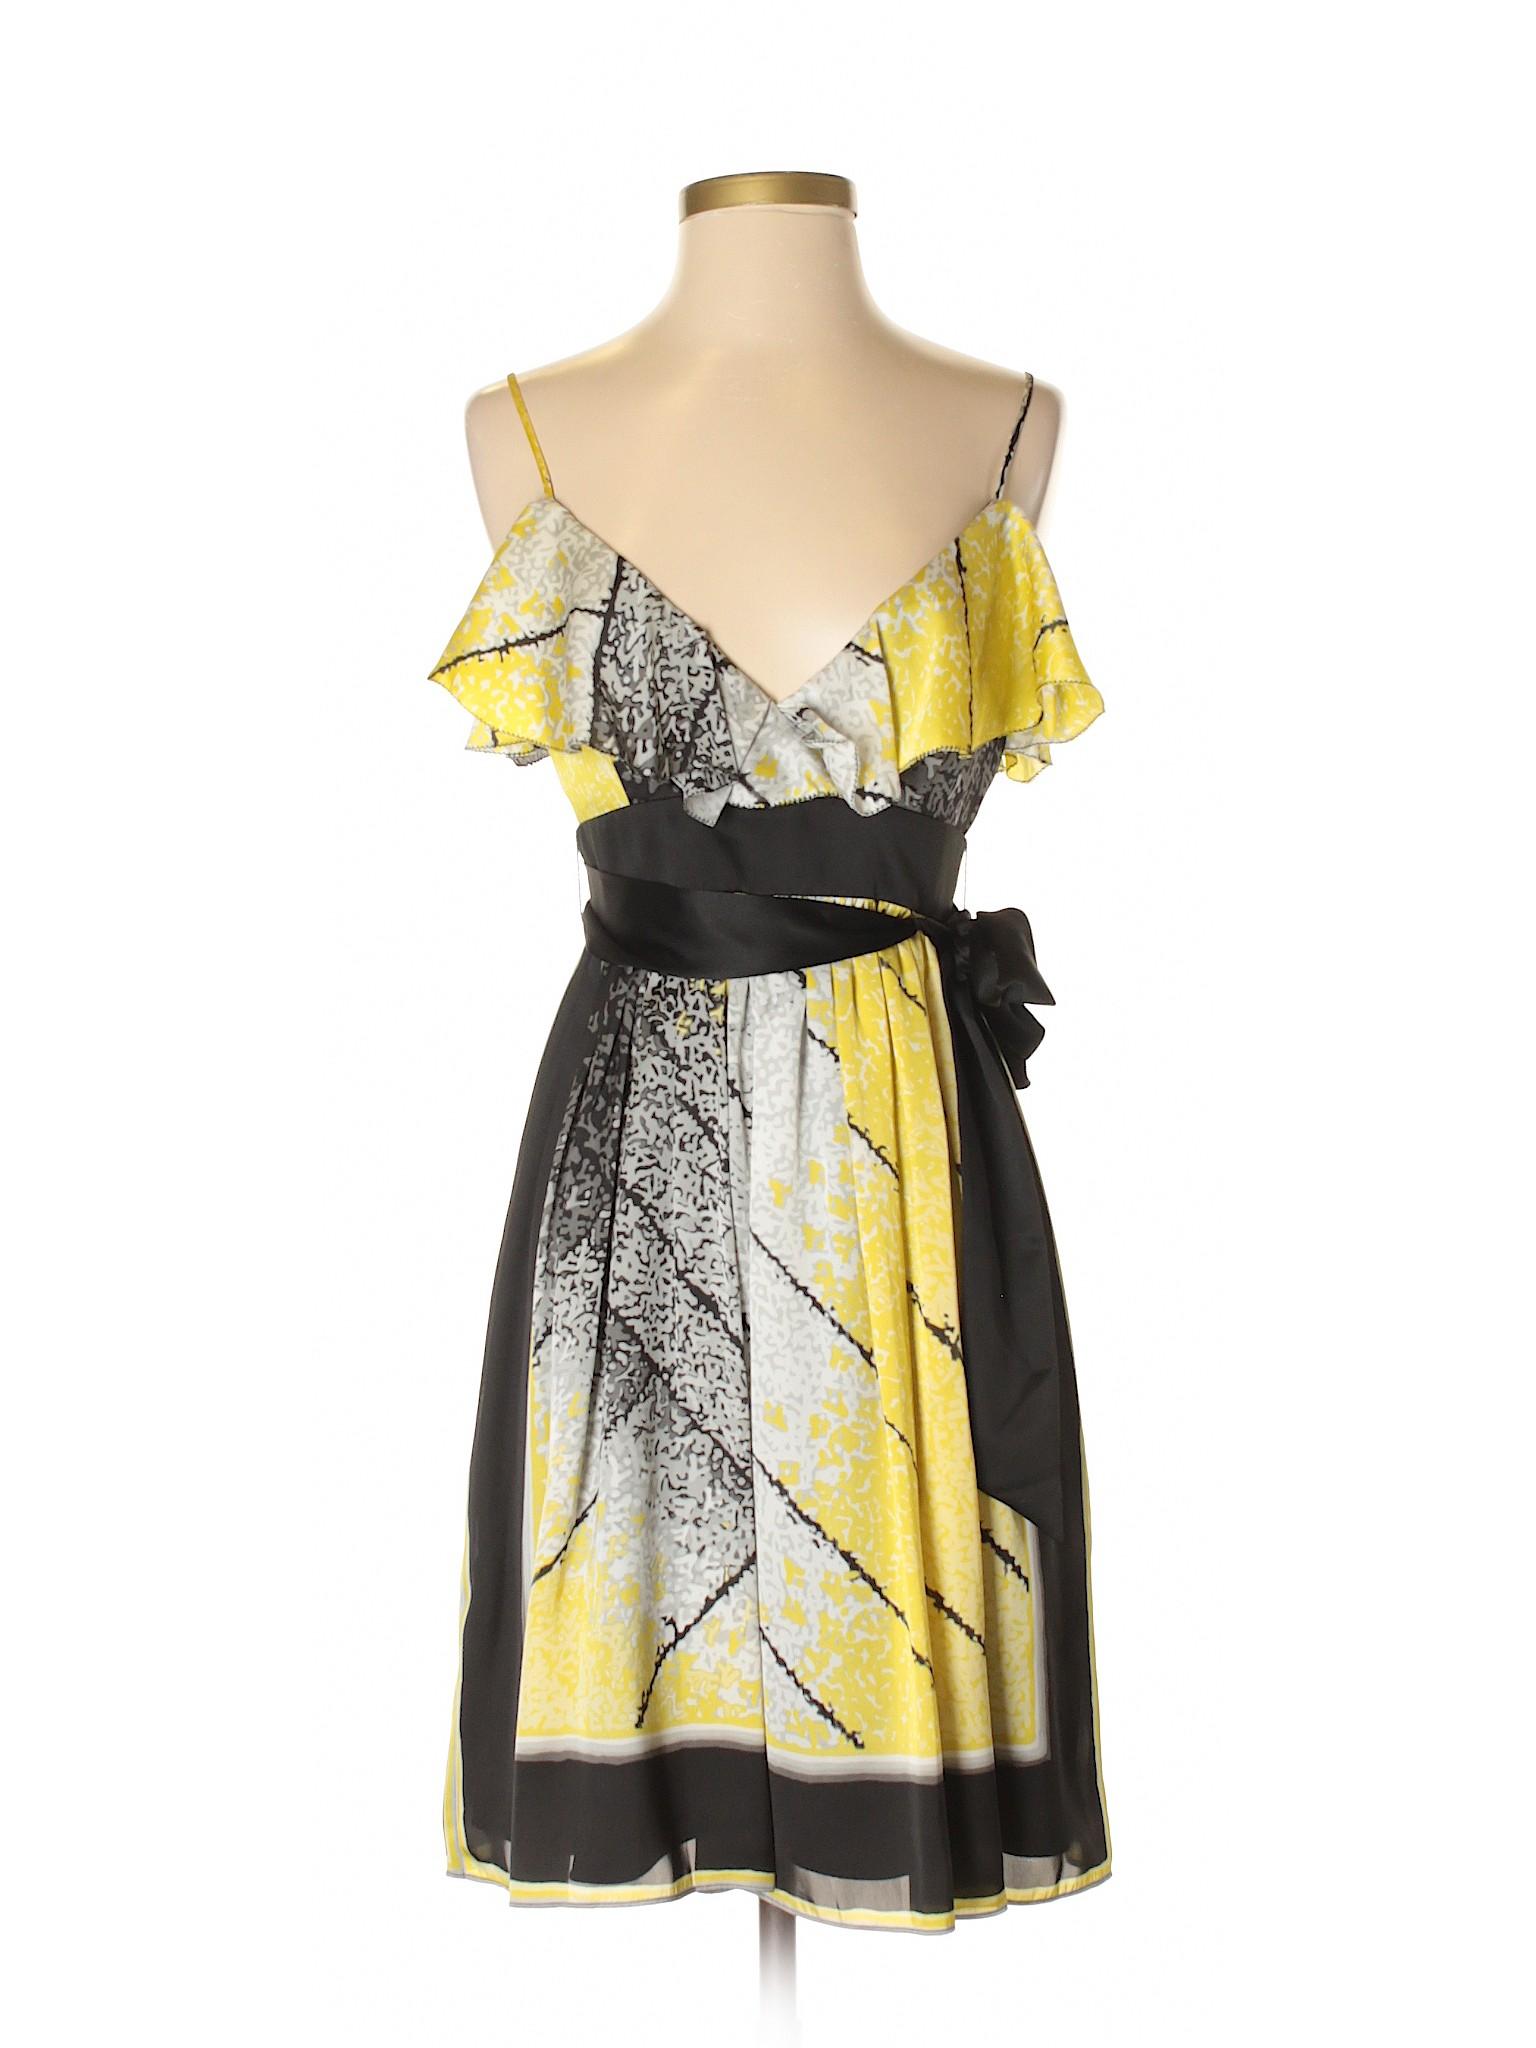 Dress Paris Casual Selling BCBG Paris BCBG Dress Selling Selling Casual x001qzBw